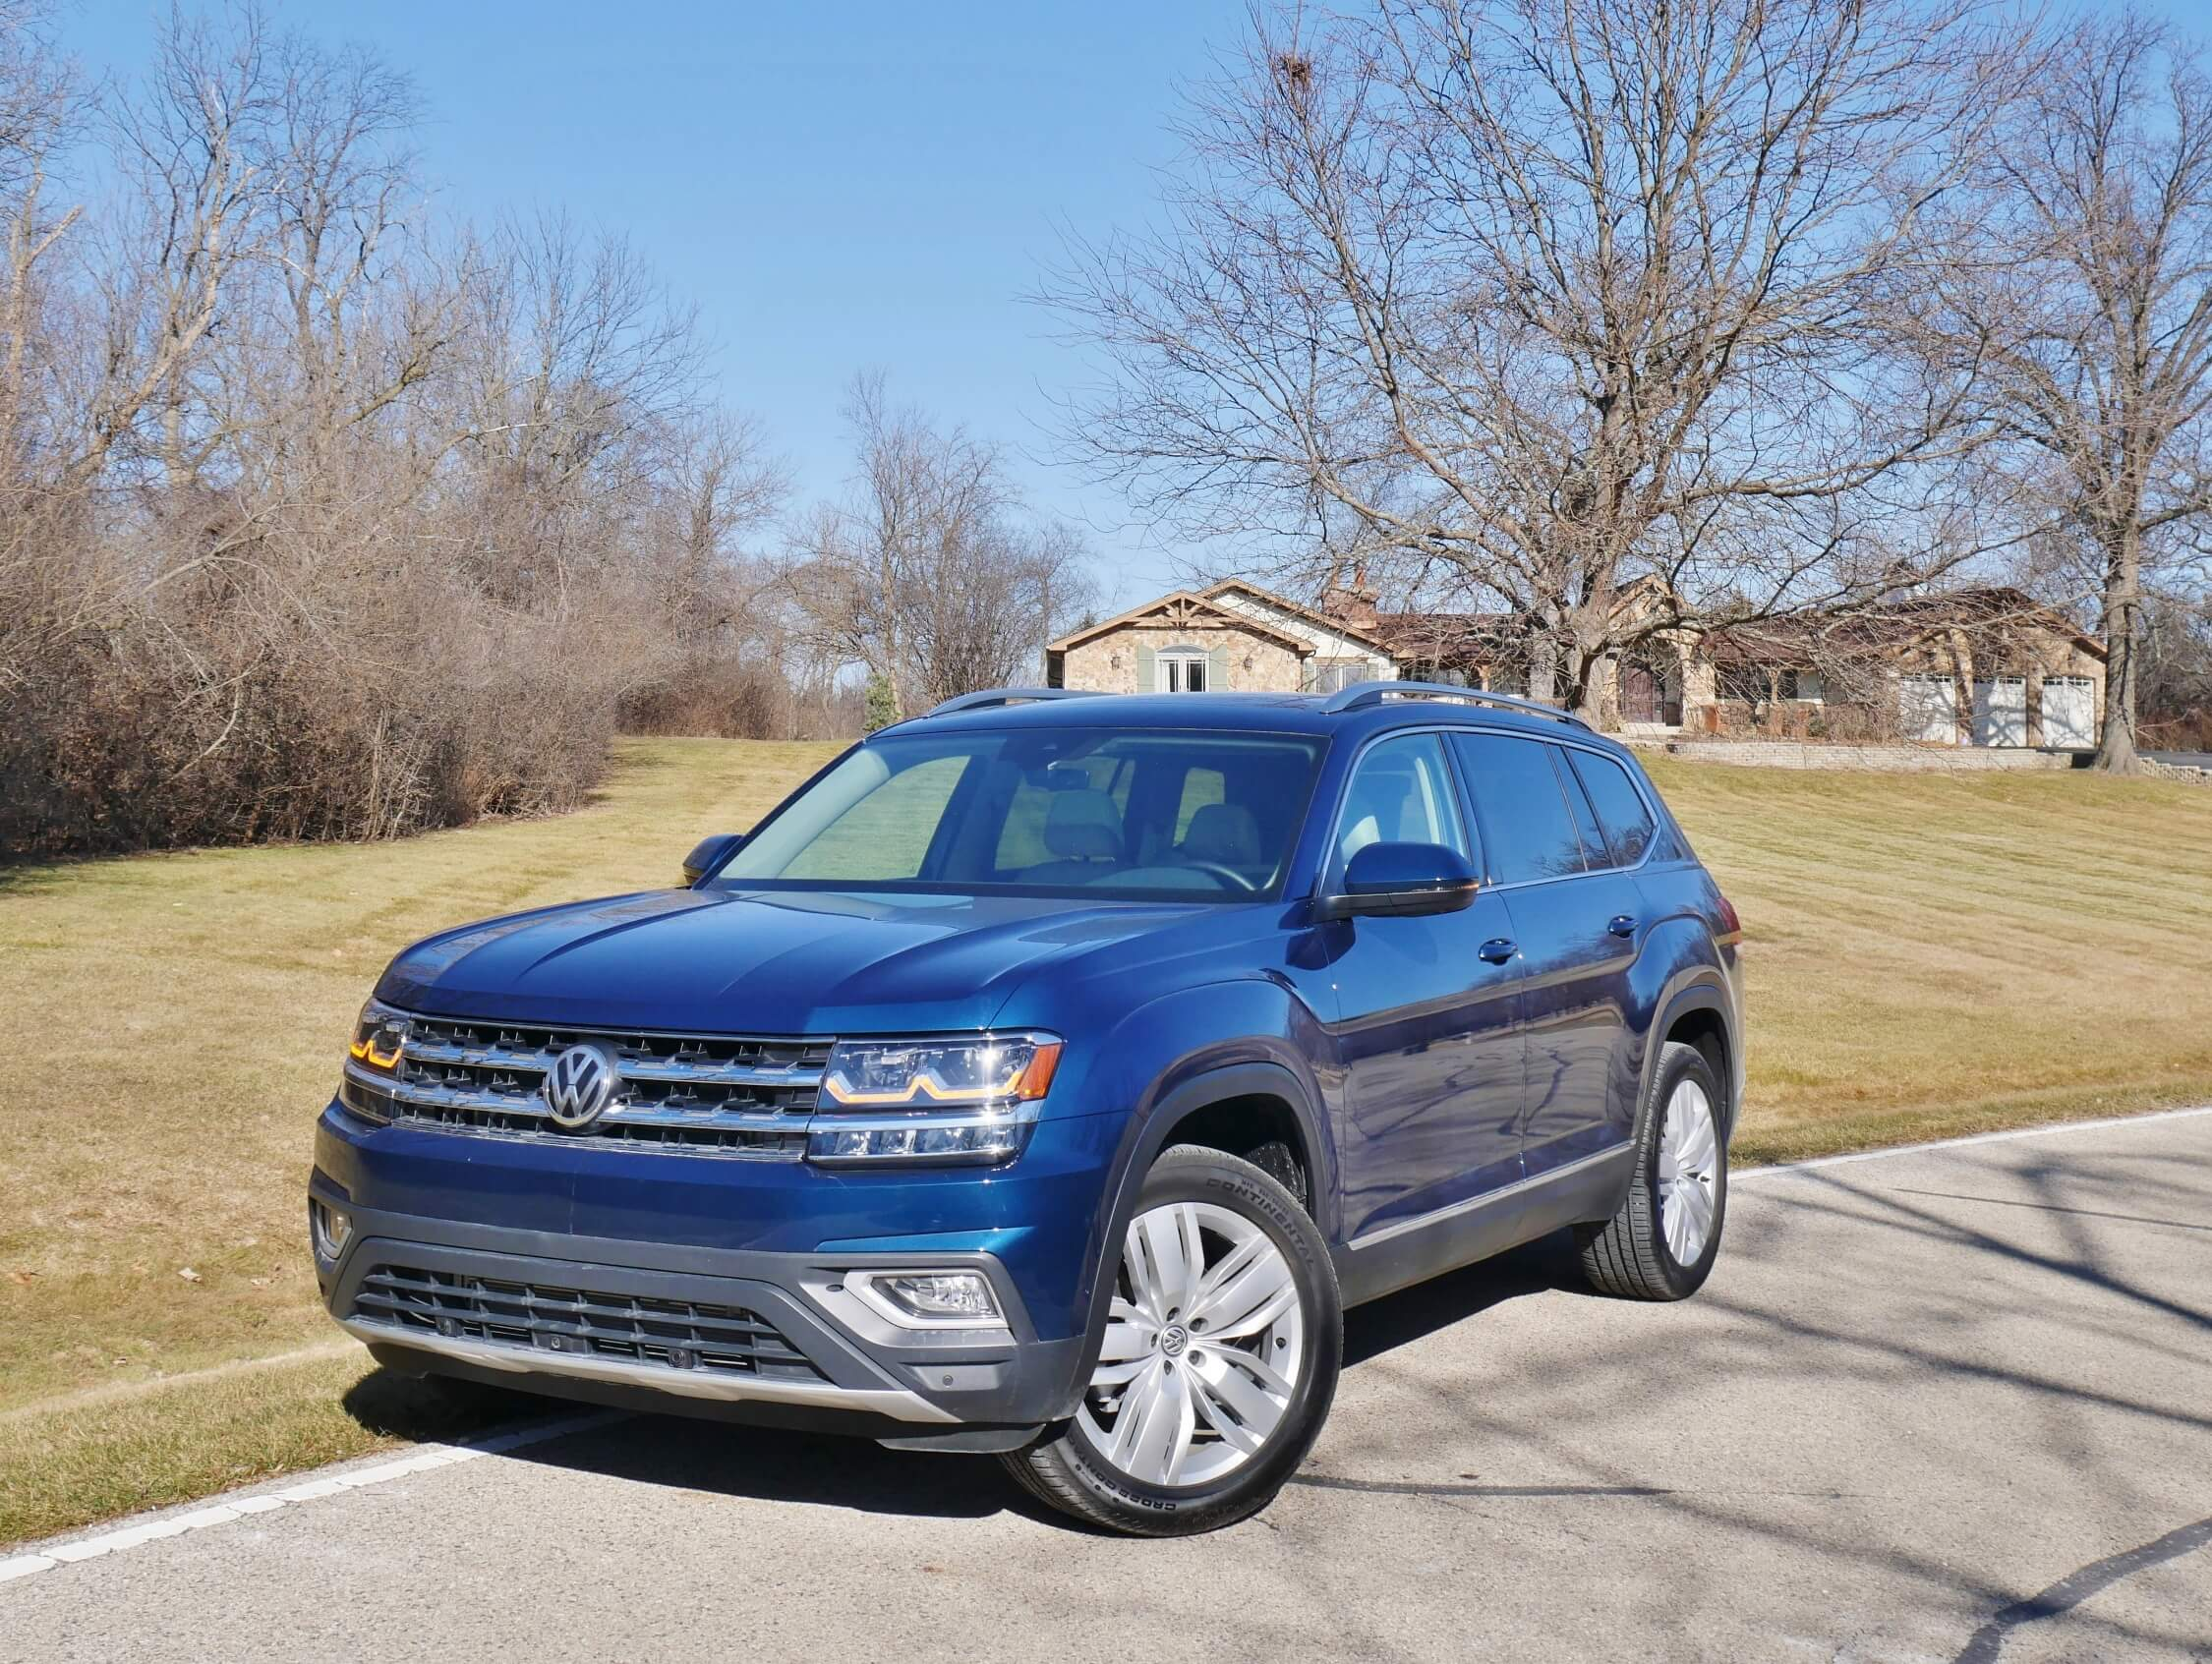 2018 Volkswagen Atlas Sel Premium 3 6 4motion Bottom Line Review Roadblazing